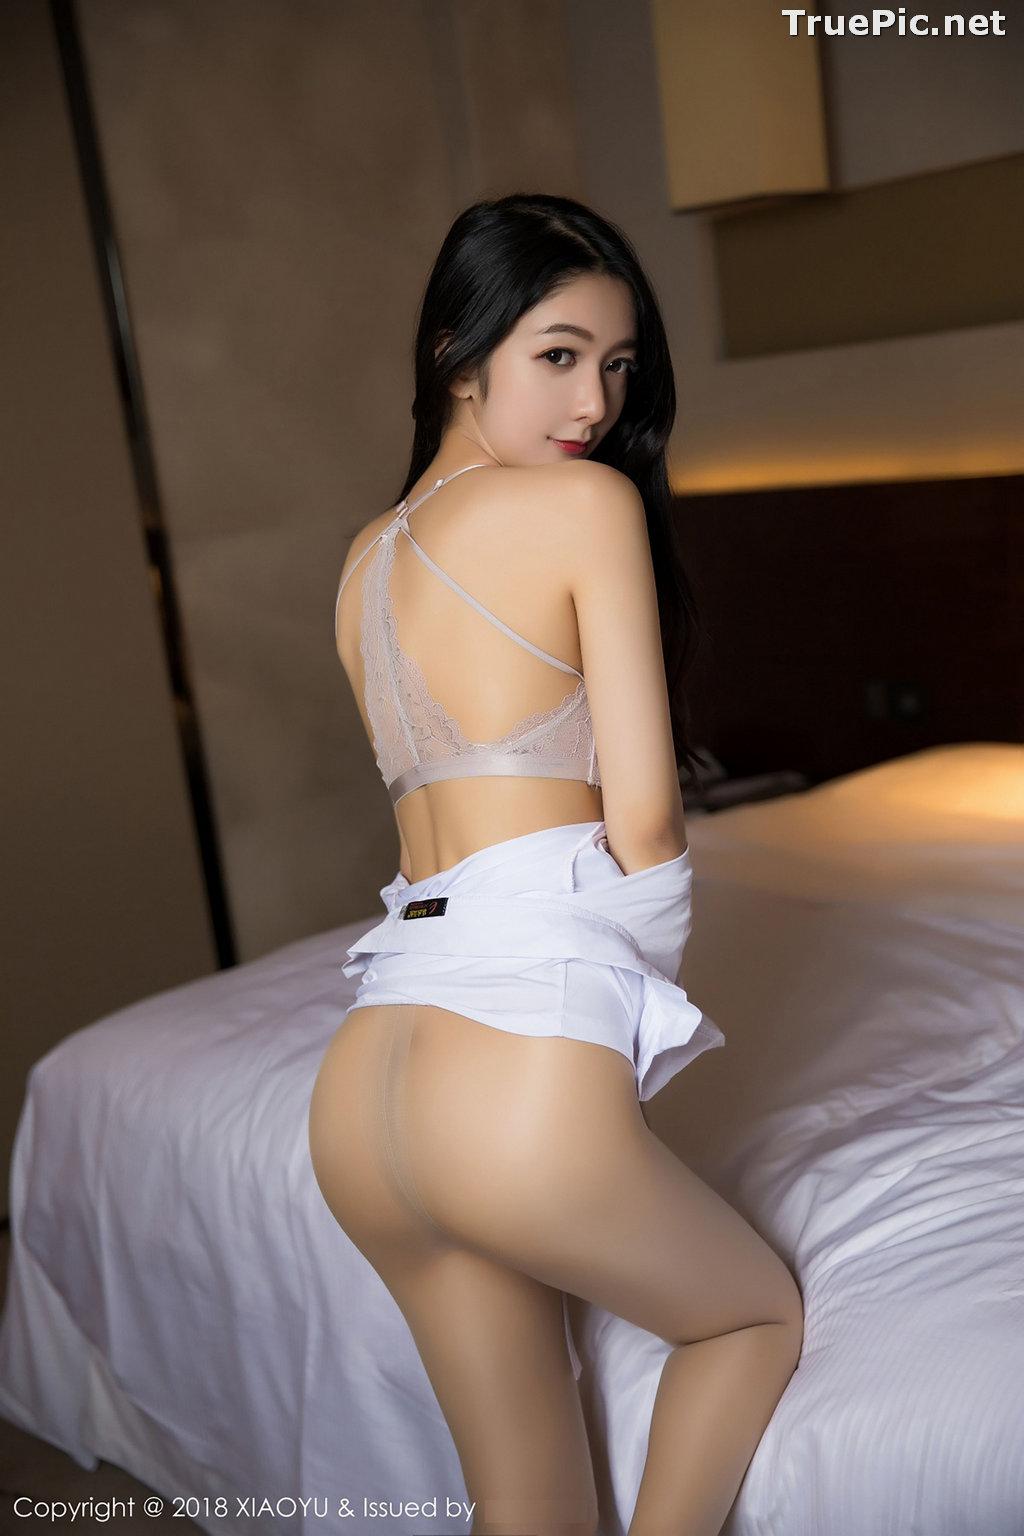 Image XiaoYu No.004 - Chinese Model - Xiao Reba (Angela喜欢猫) - White Sexy Nurse - TruePic.net - Picture-38